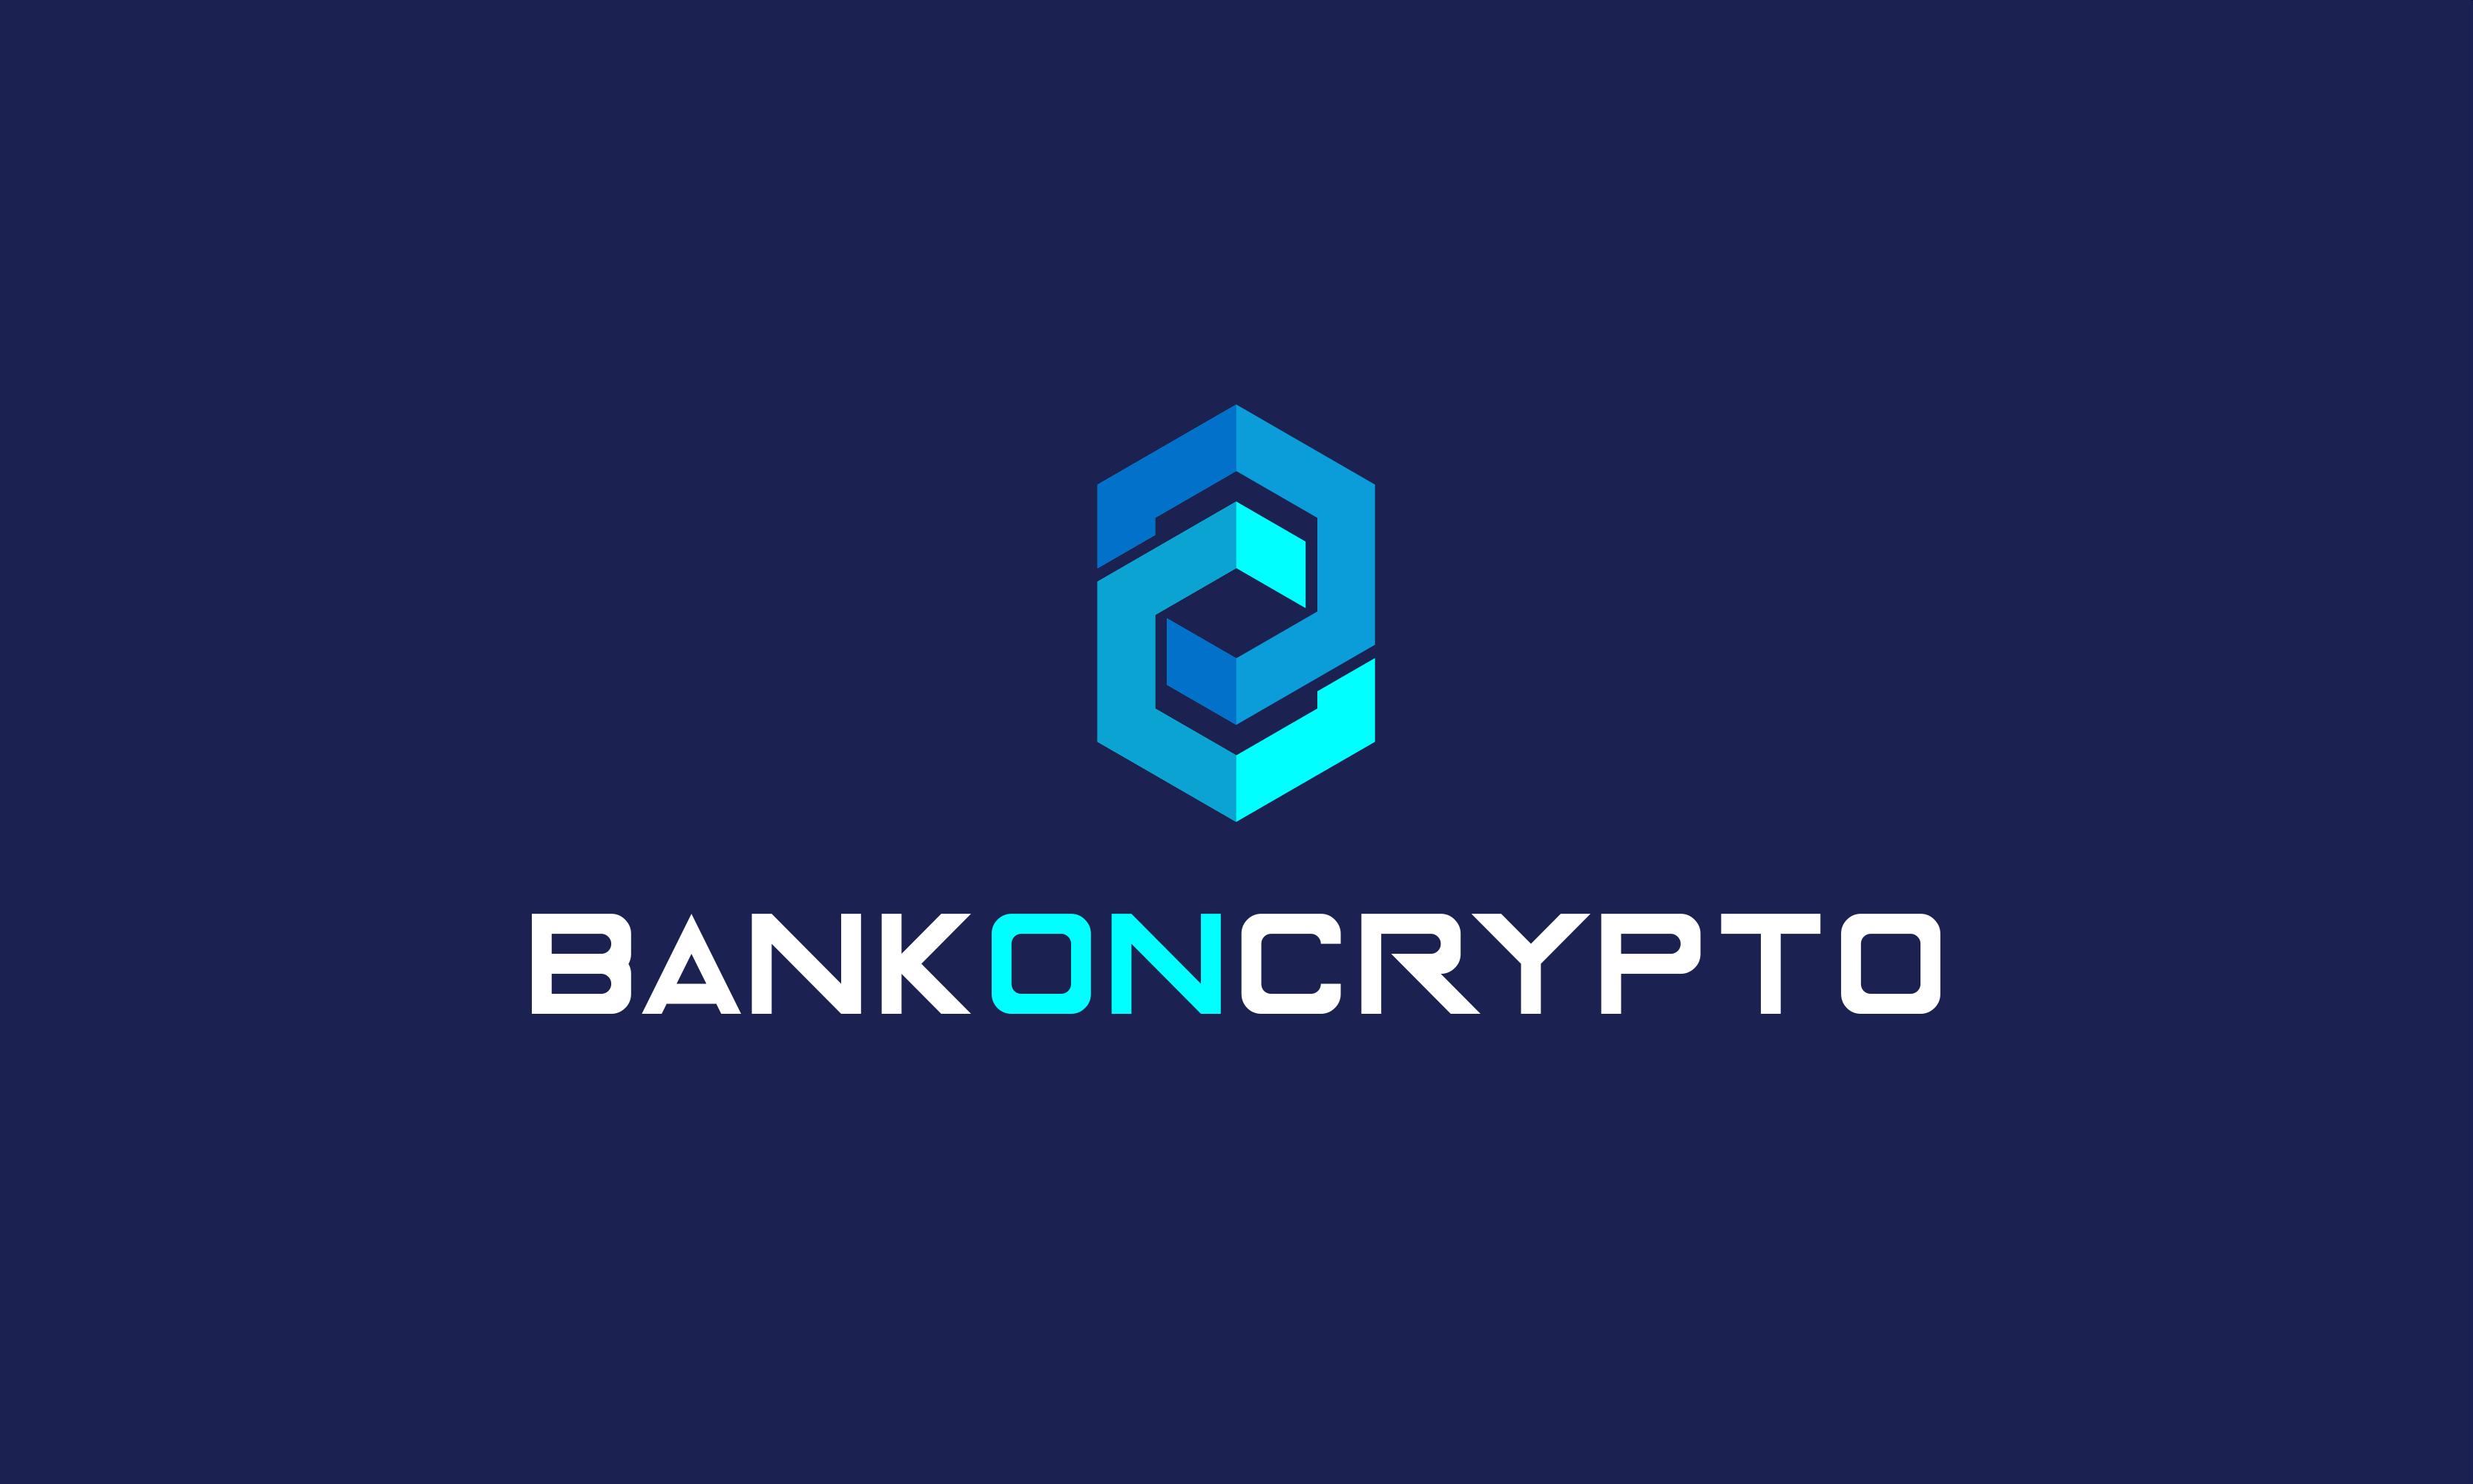 Bankoncrypto